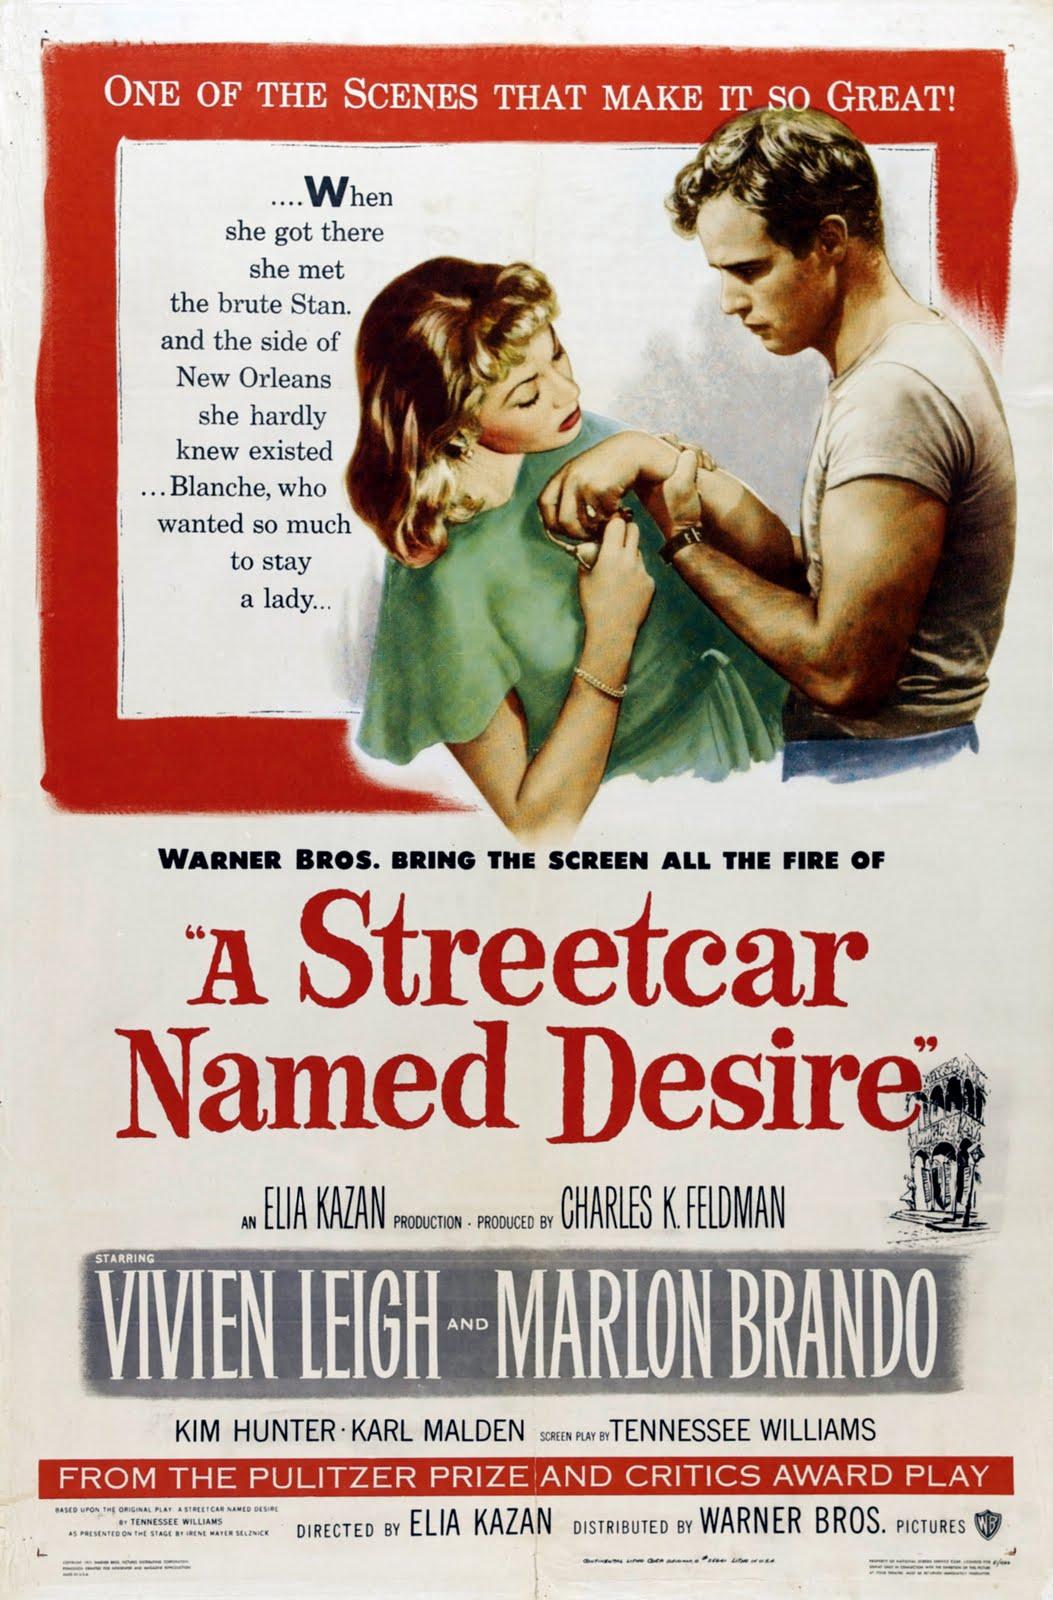 art of desire movie